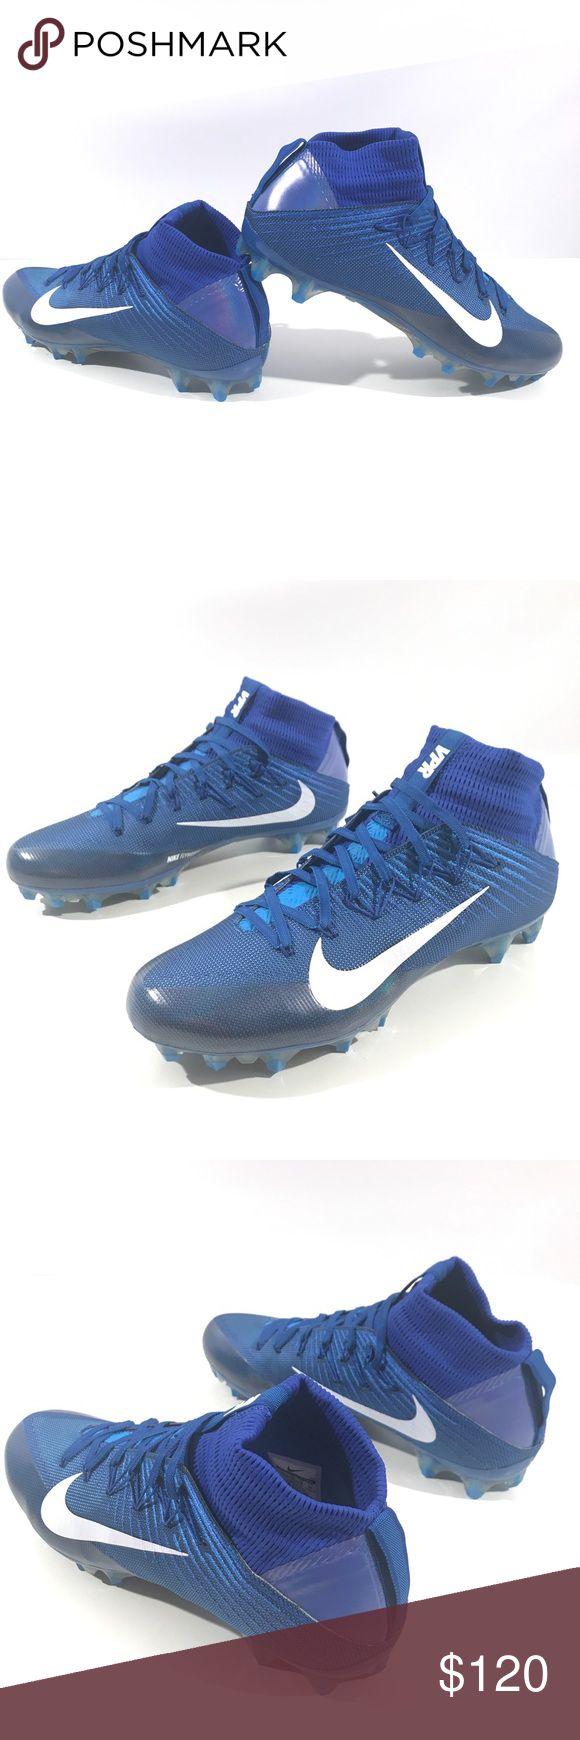 New men's nike vapor untouchable 2 football cleats. Nike VaporShoe BagFootball  ...